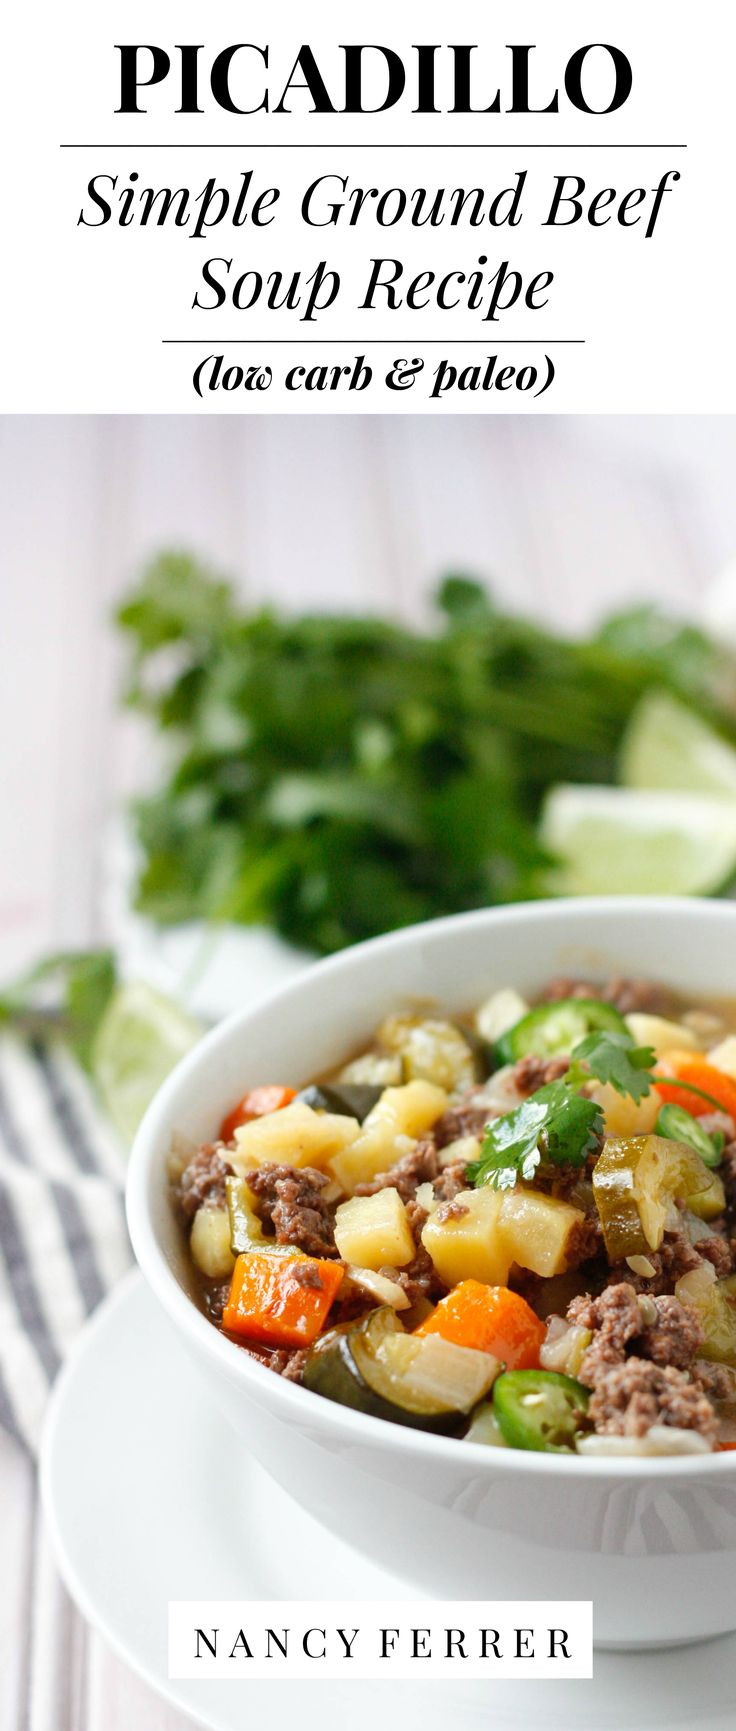 Ground Beef Recipes Healthy Paleo  Picadillo